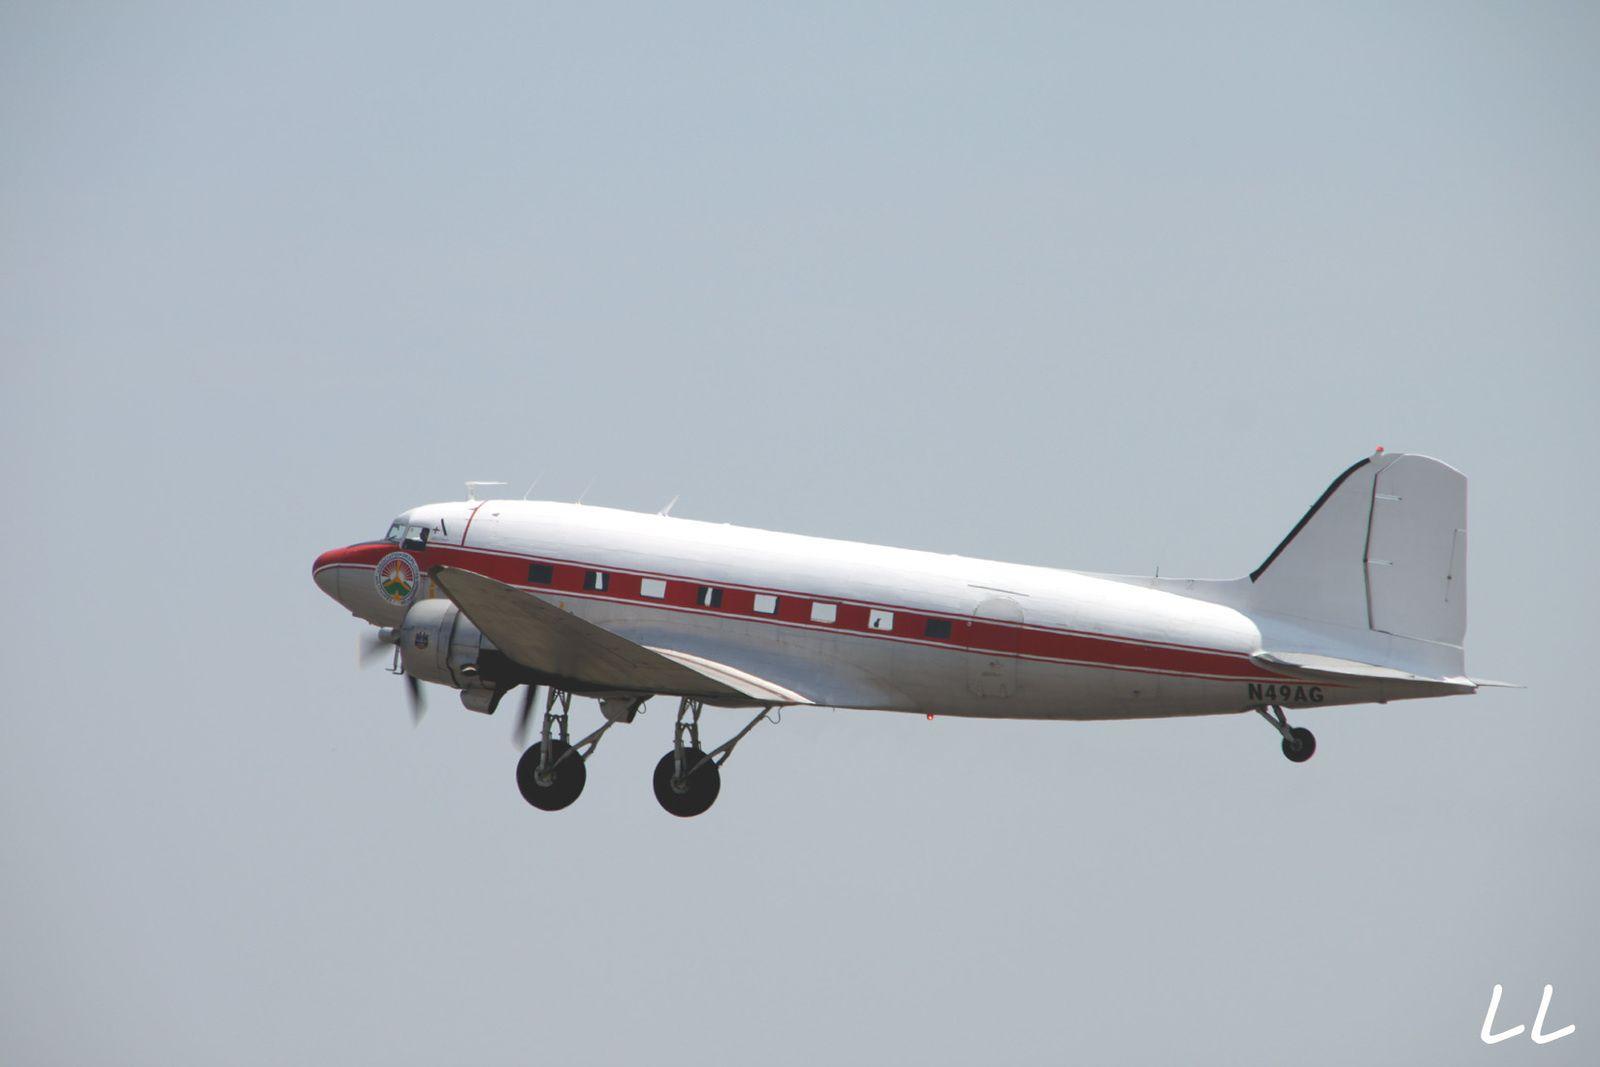 Le Douglas DC-3 N49AG basé à Melun-Villaroche.